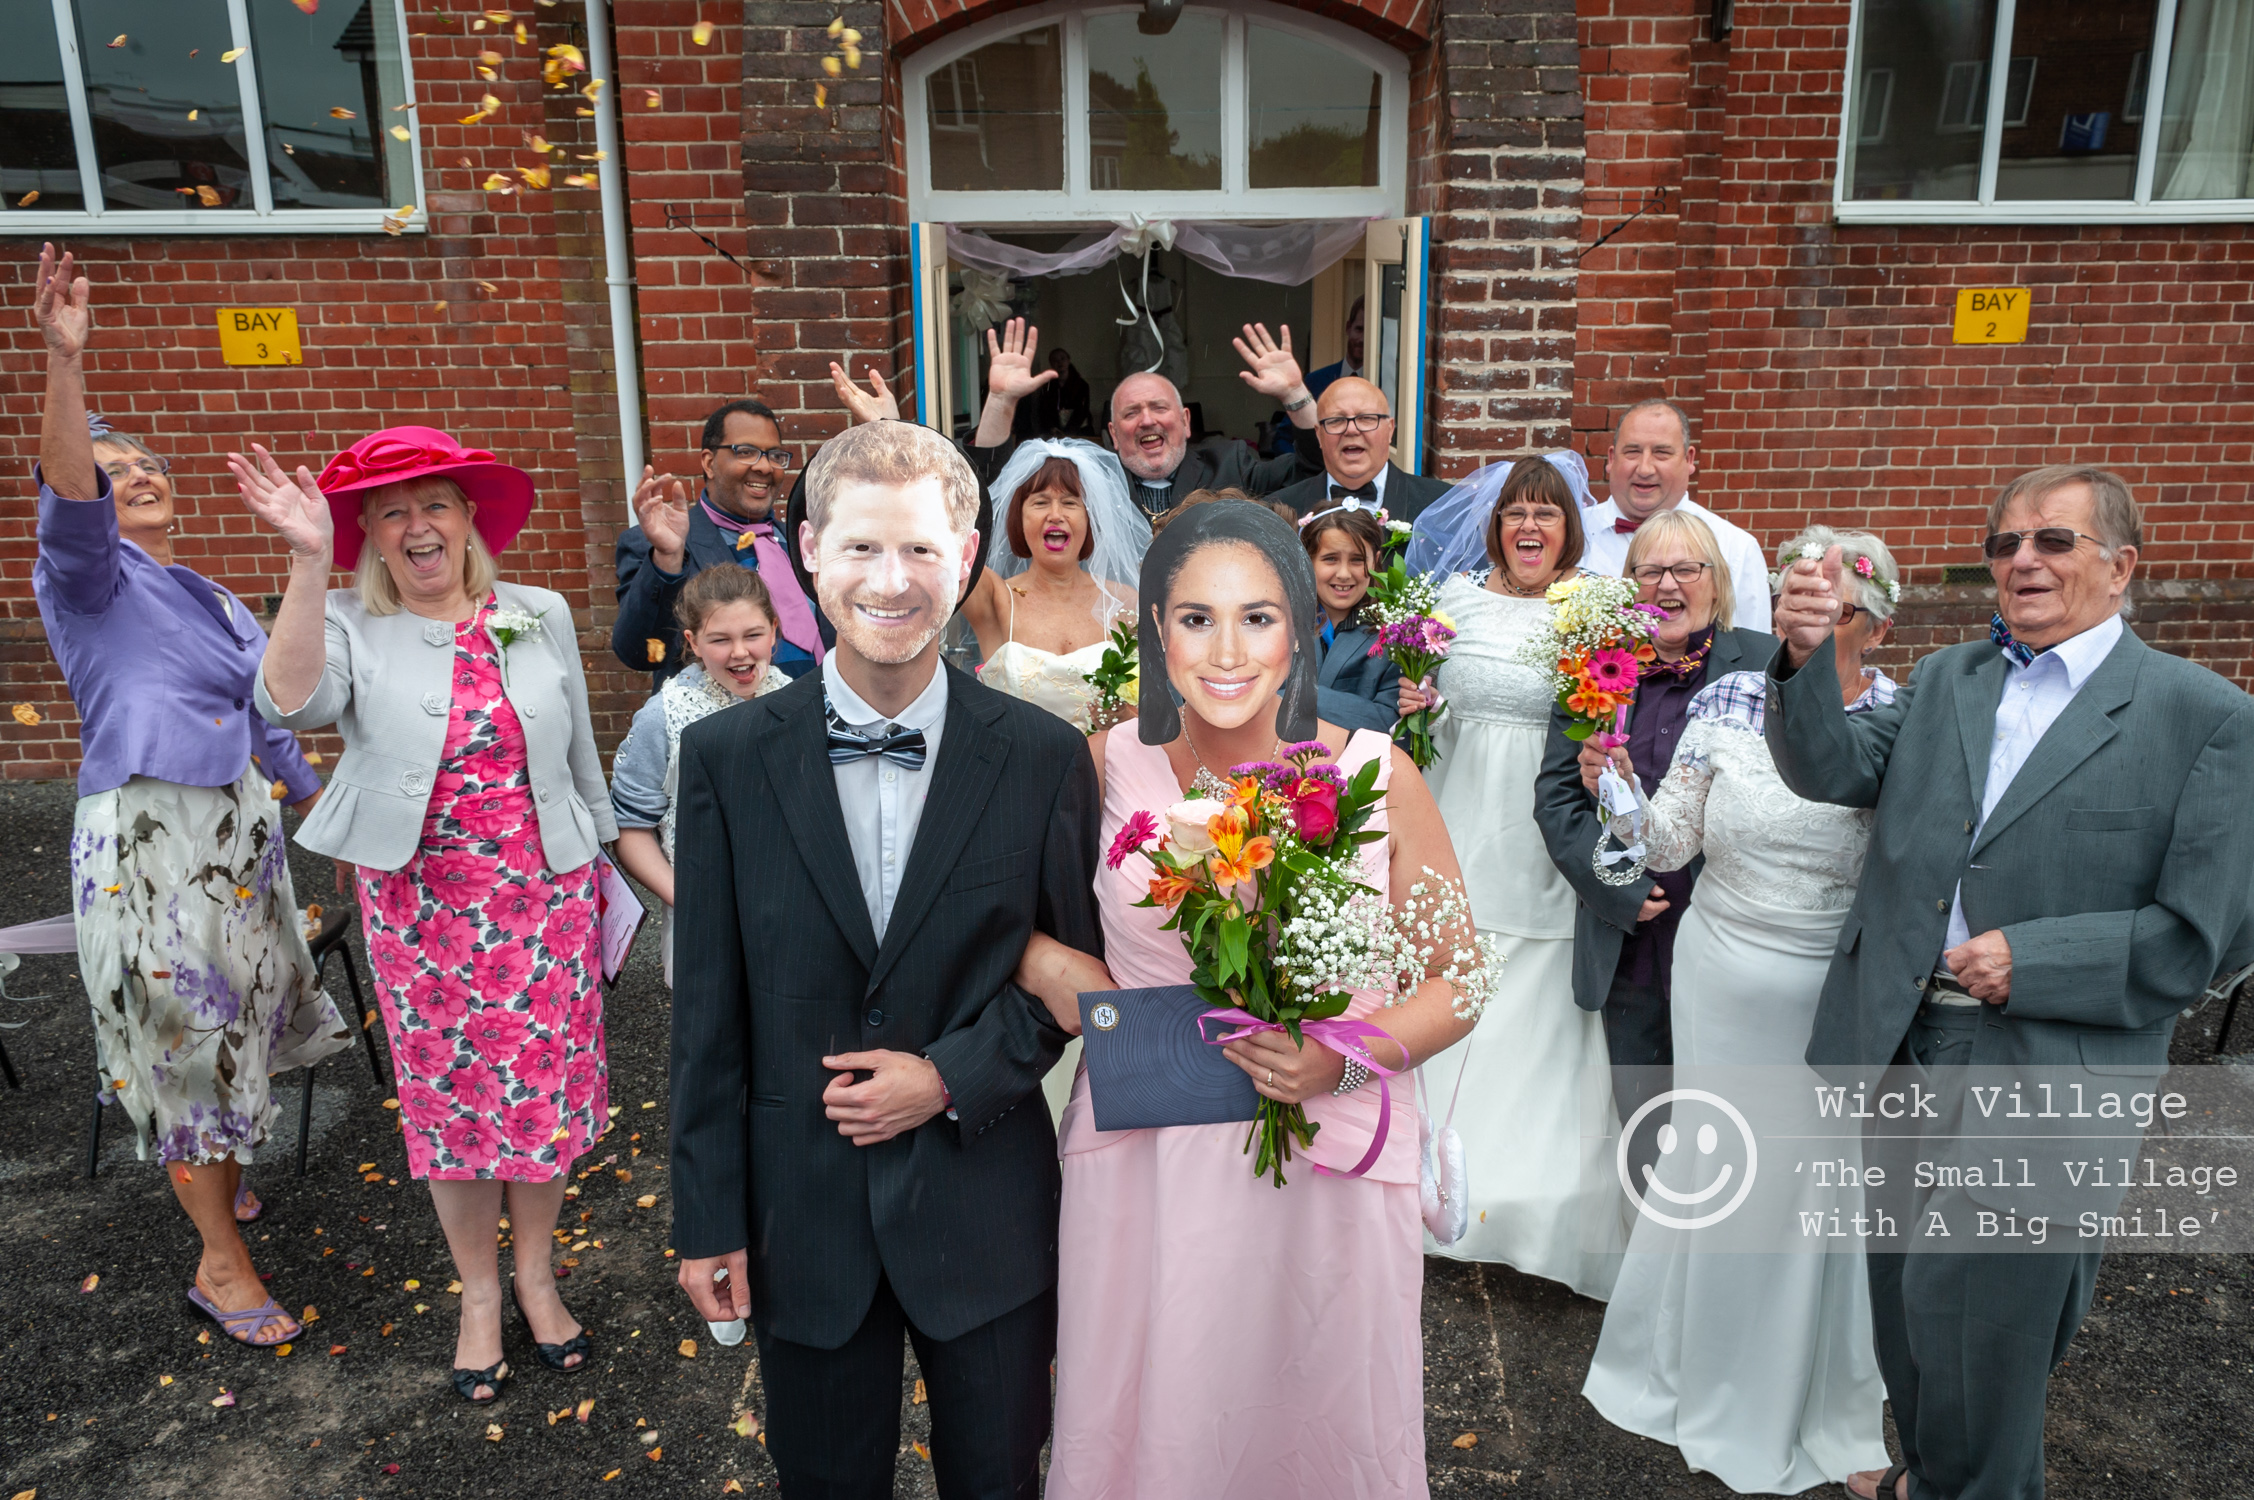 Royal Wedding Celebrations Littlehampton, West Sussex, UK.